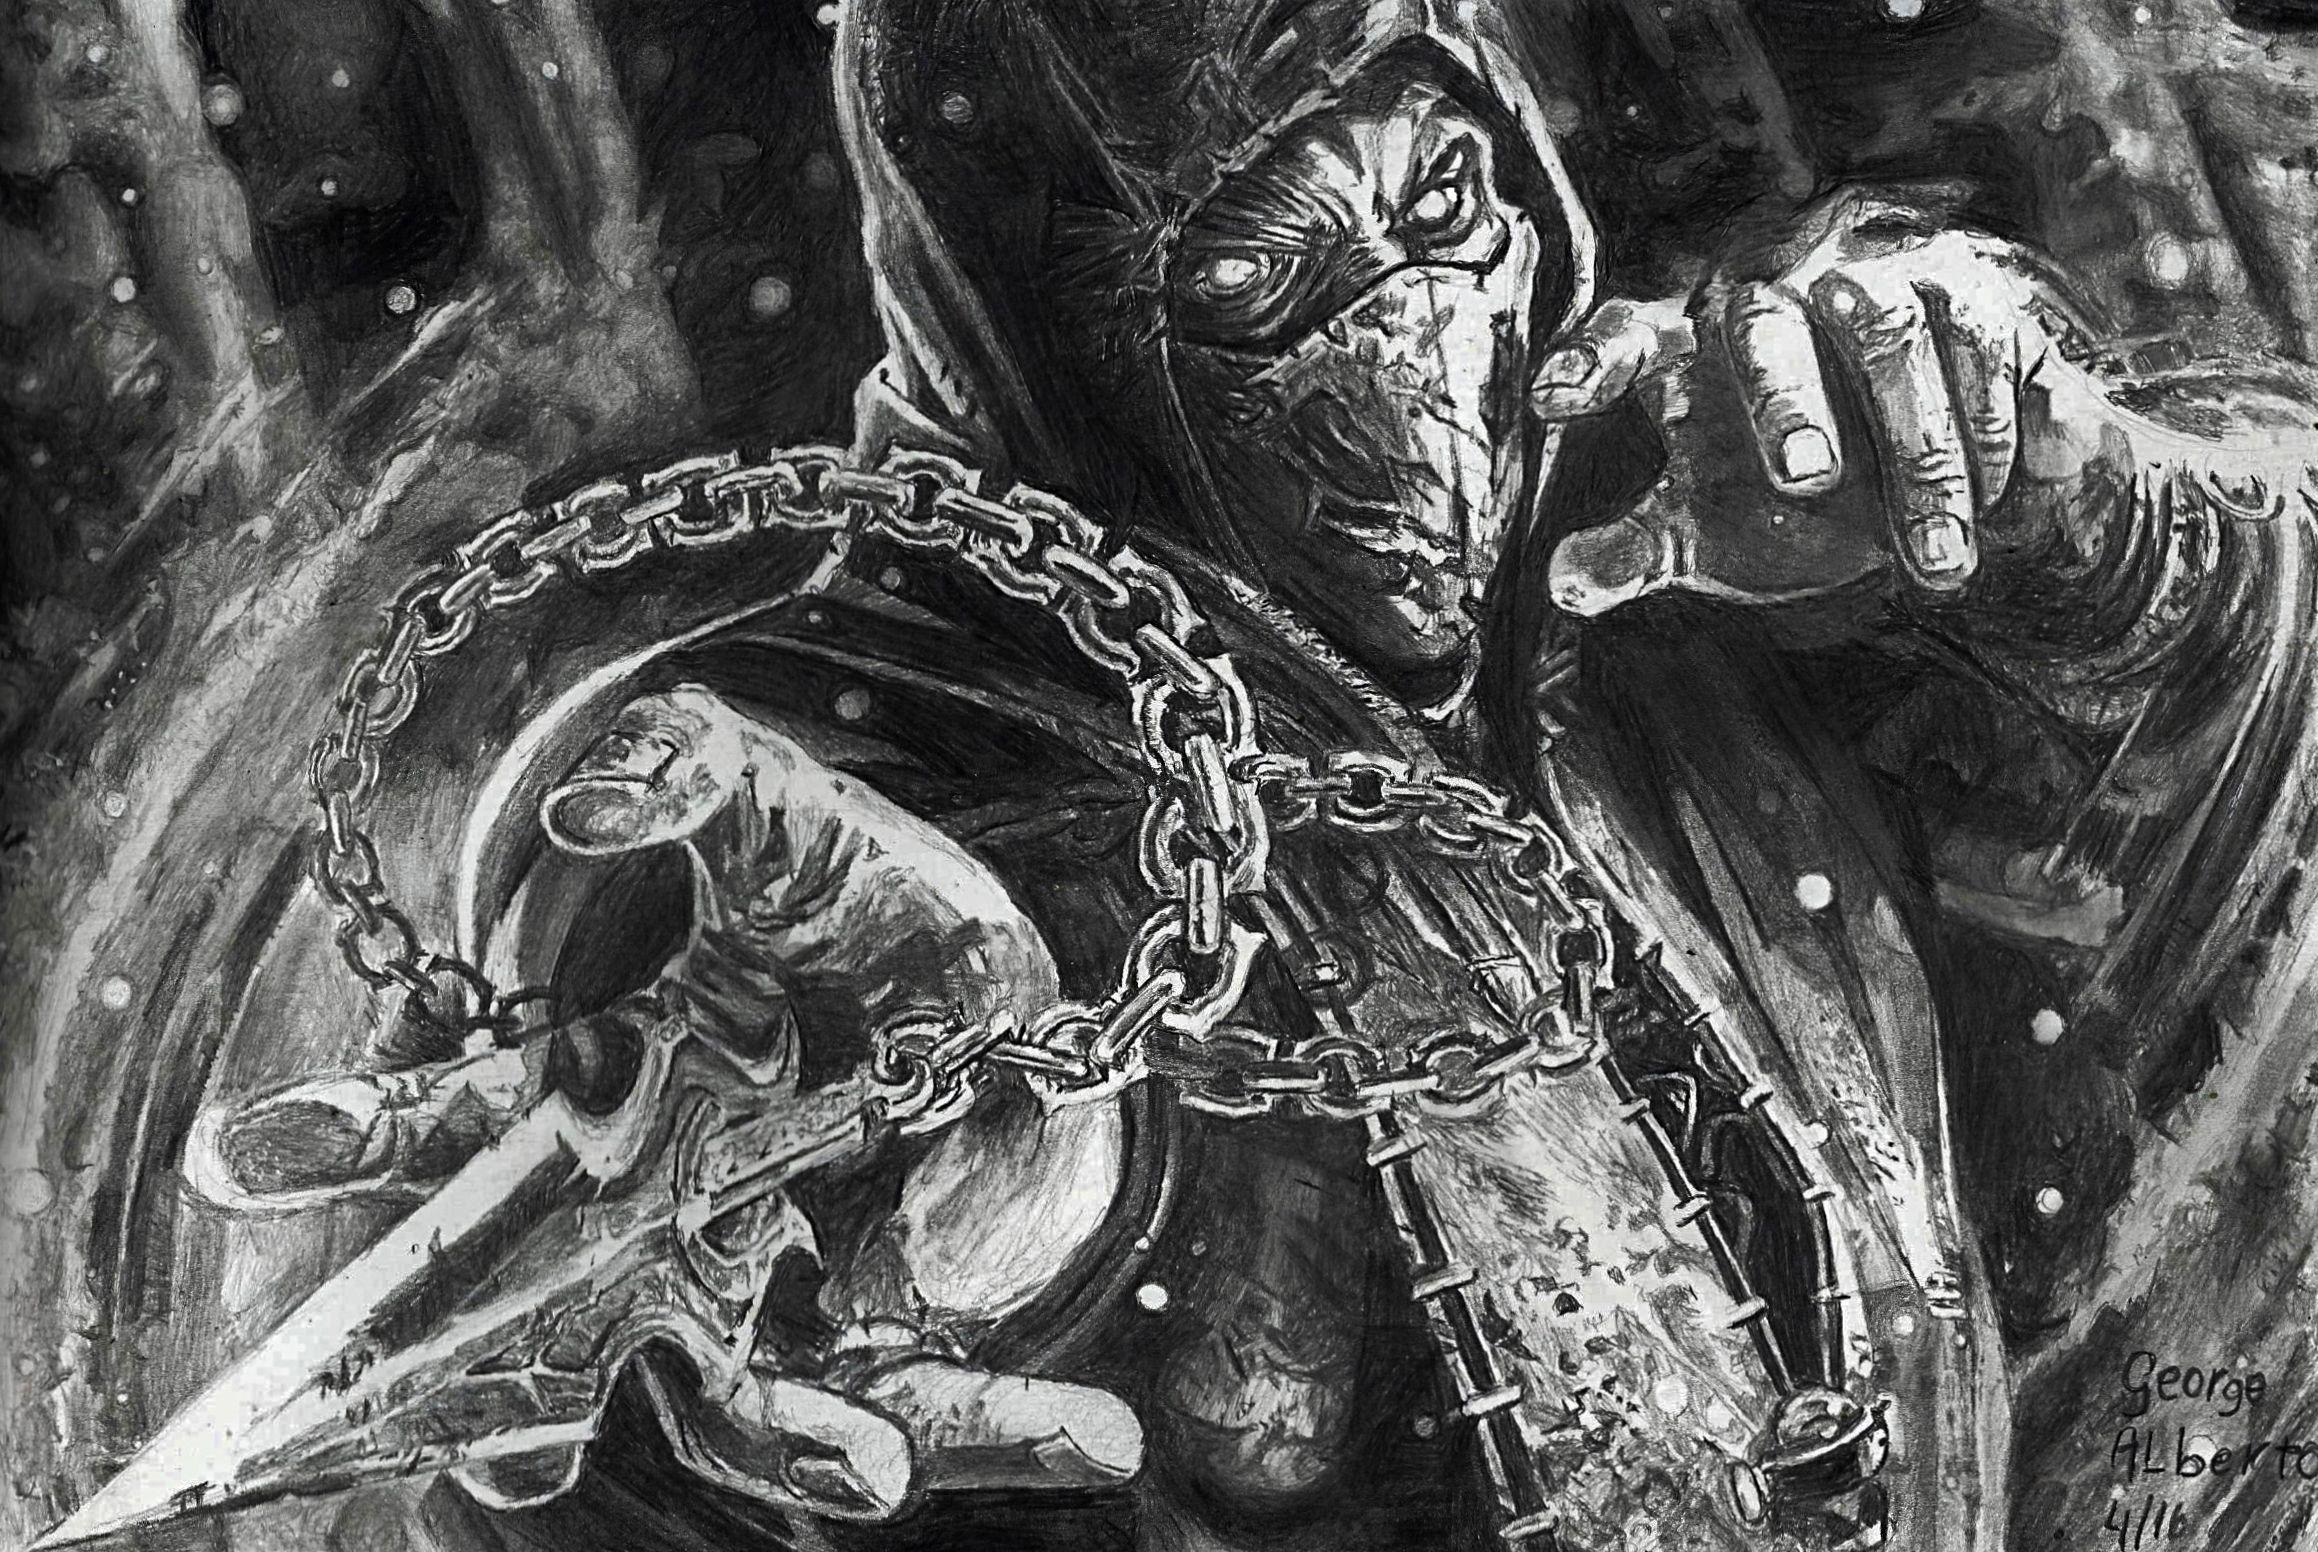 Scorpion Mortal Kombat Pencil Drawing Scorpion Mortal Kombat